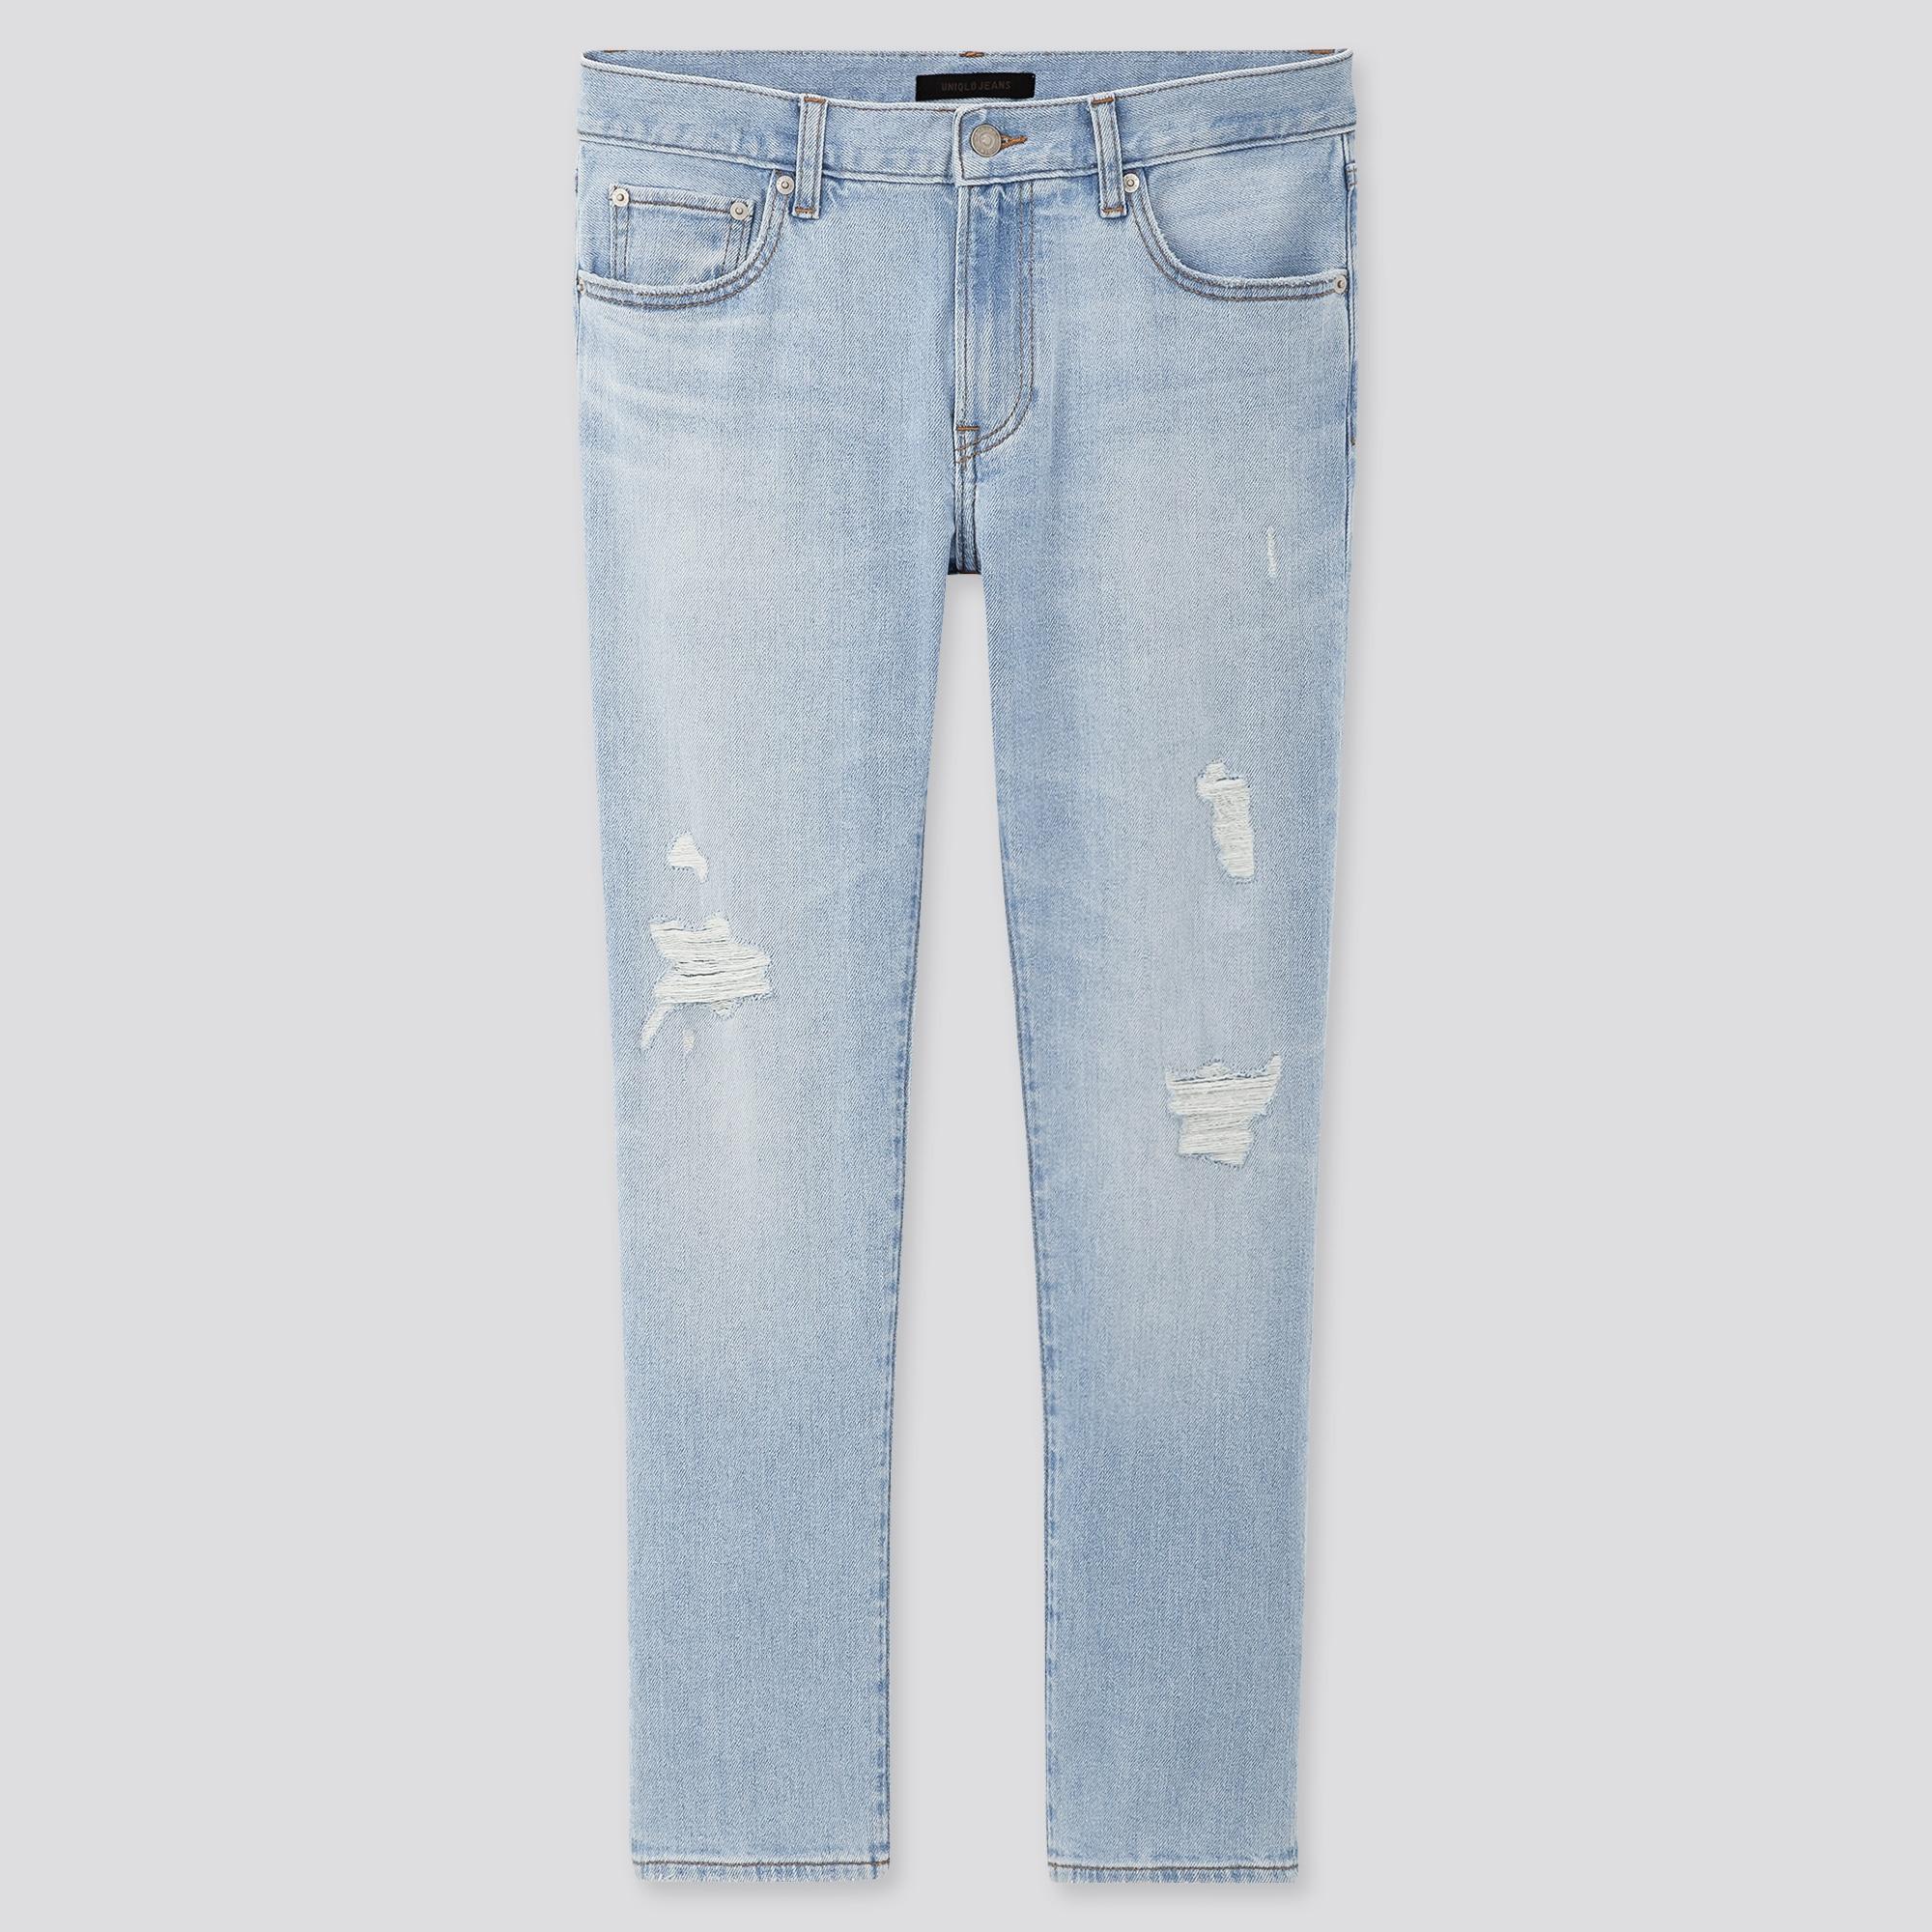 Men Slim Fit Distressed Jeans